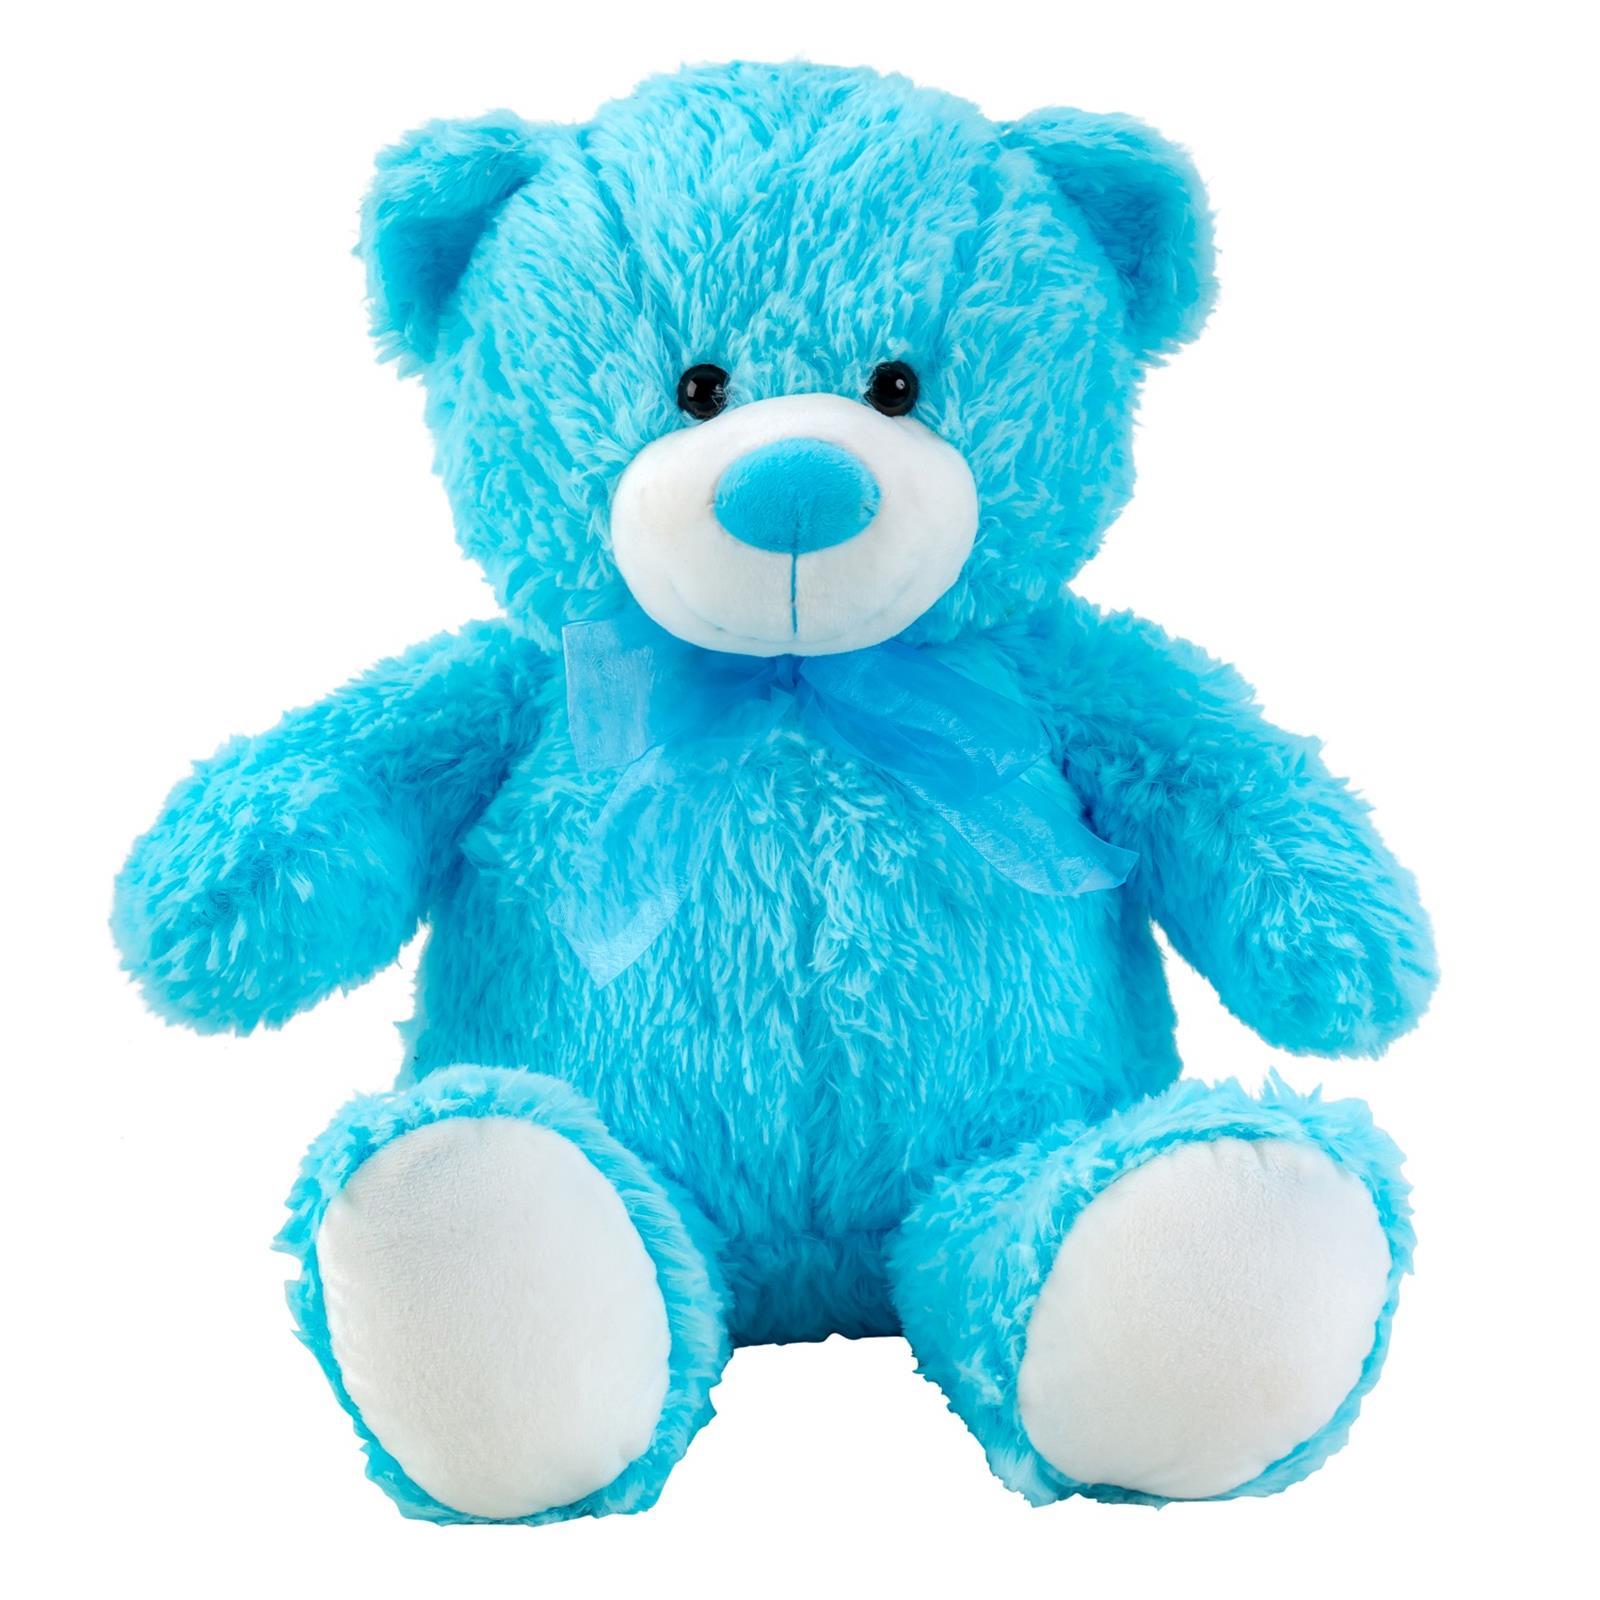 Teddybär Blau mit Schleife